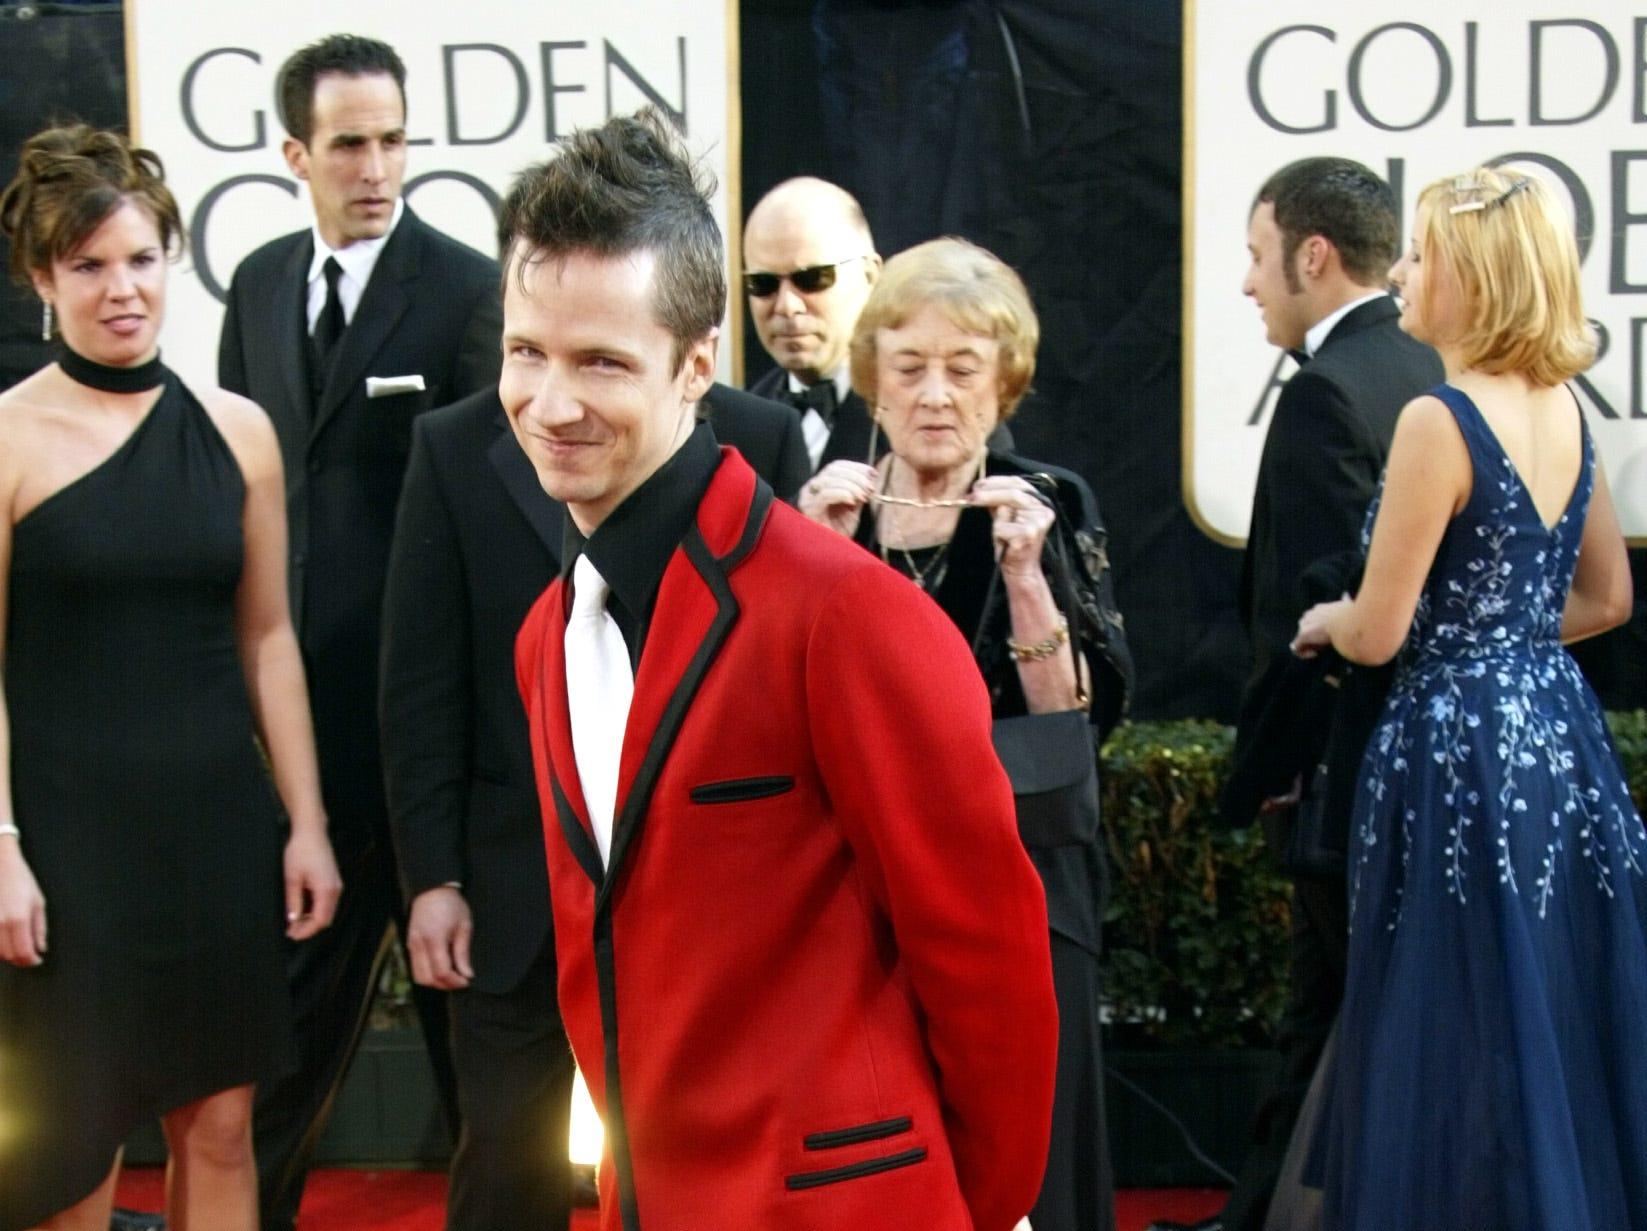 January 20, 2002 - Los Angeles, CA -- Golden Globe Awards --    JOhn Cameron Mitchell arrives at the 59th annual Golden Globe Awards.